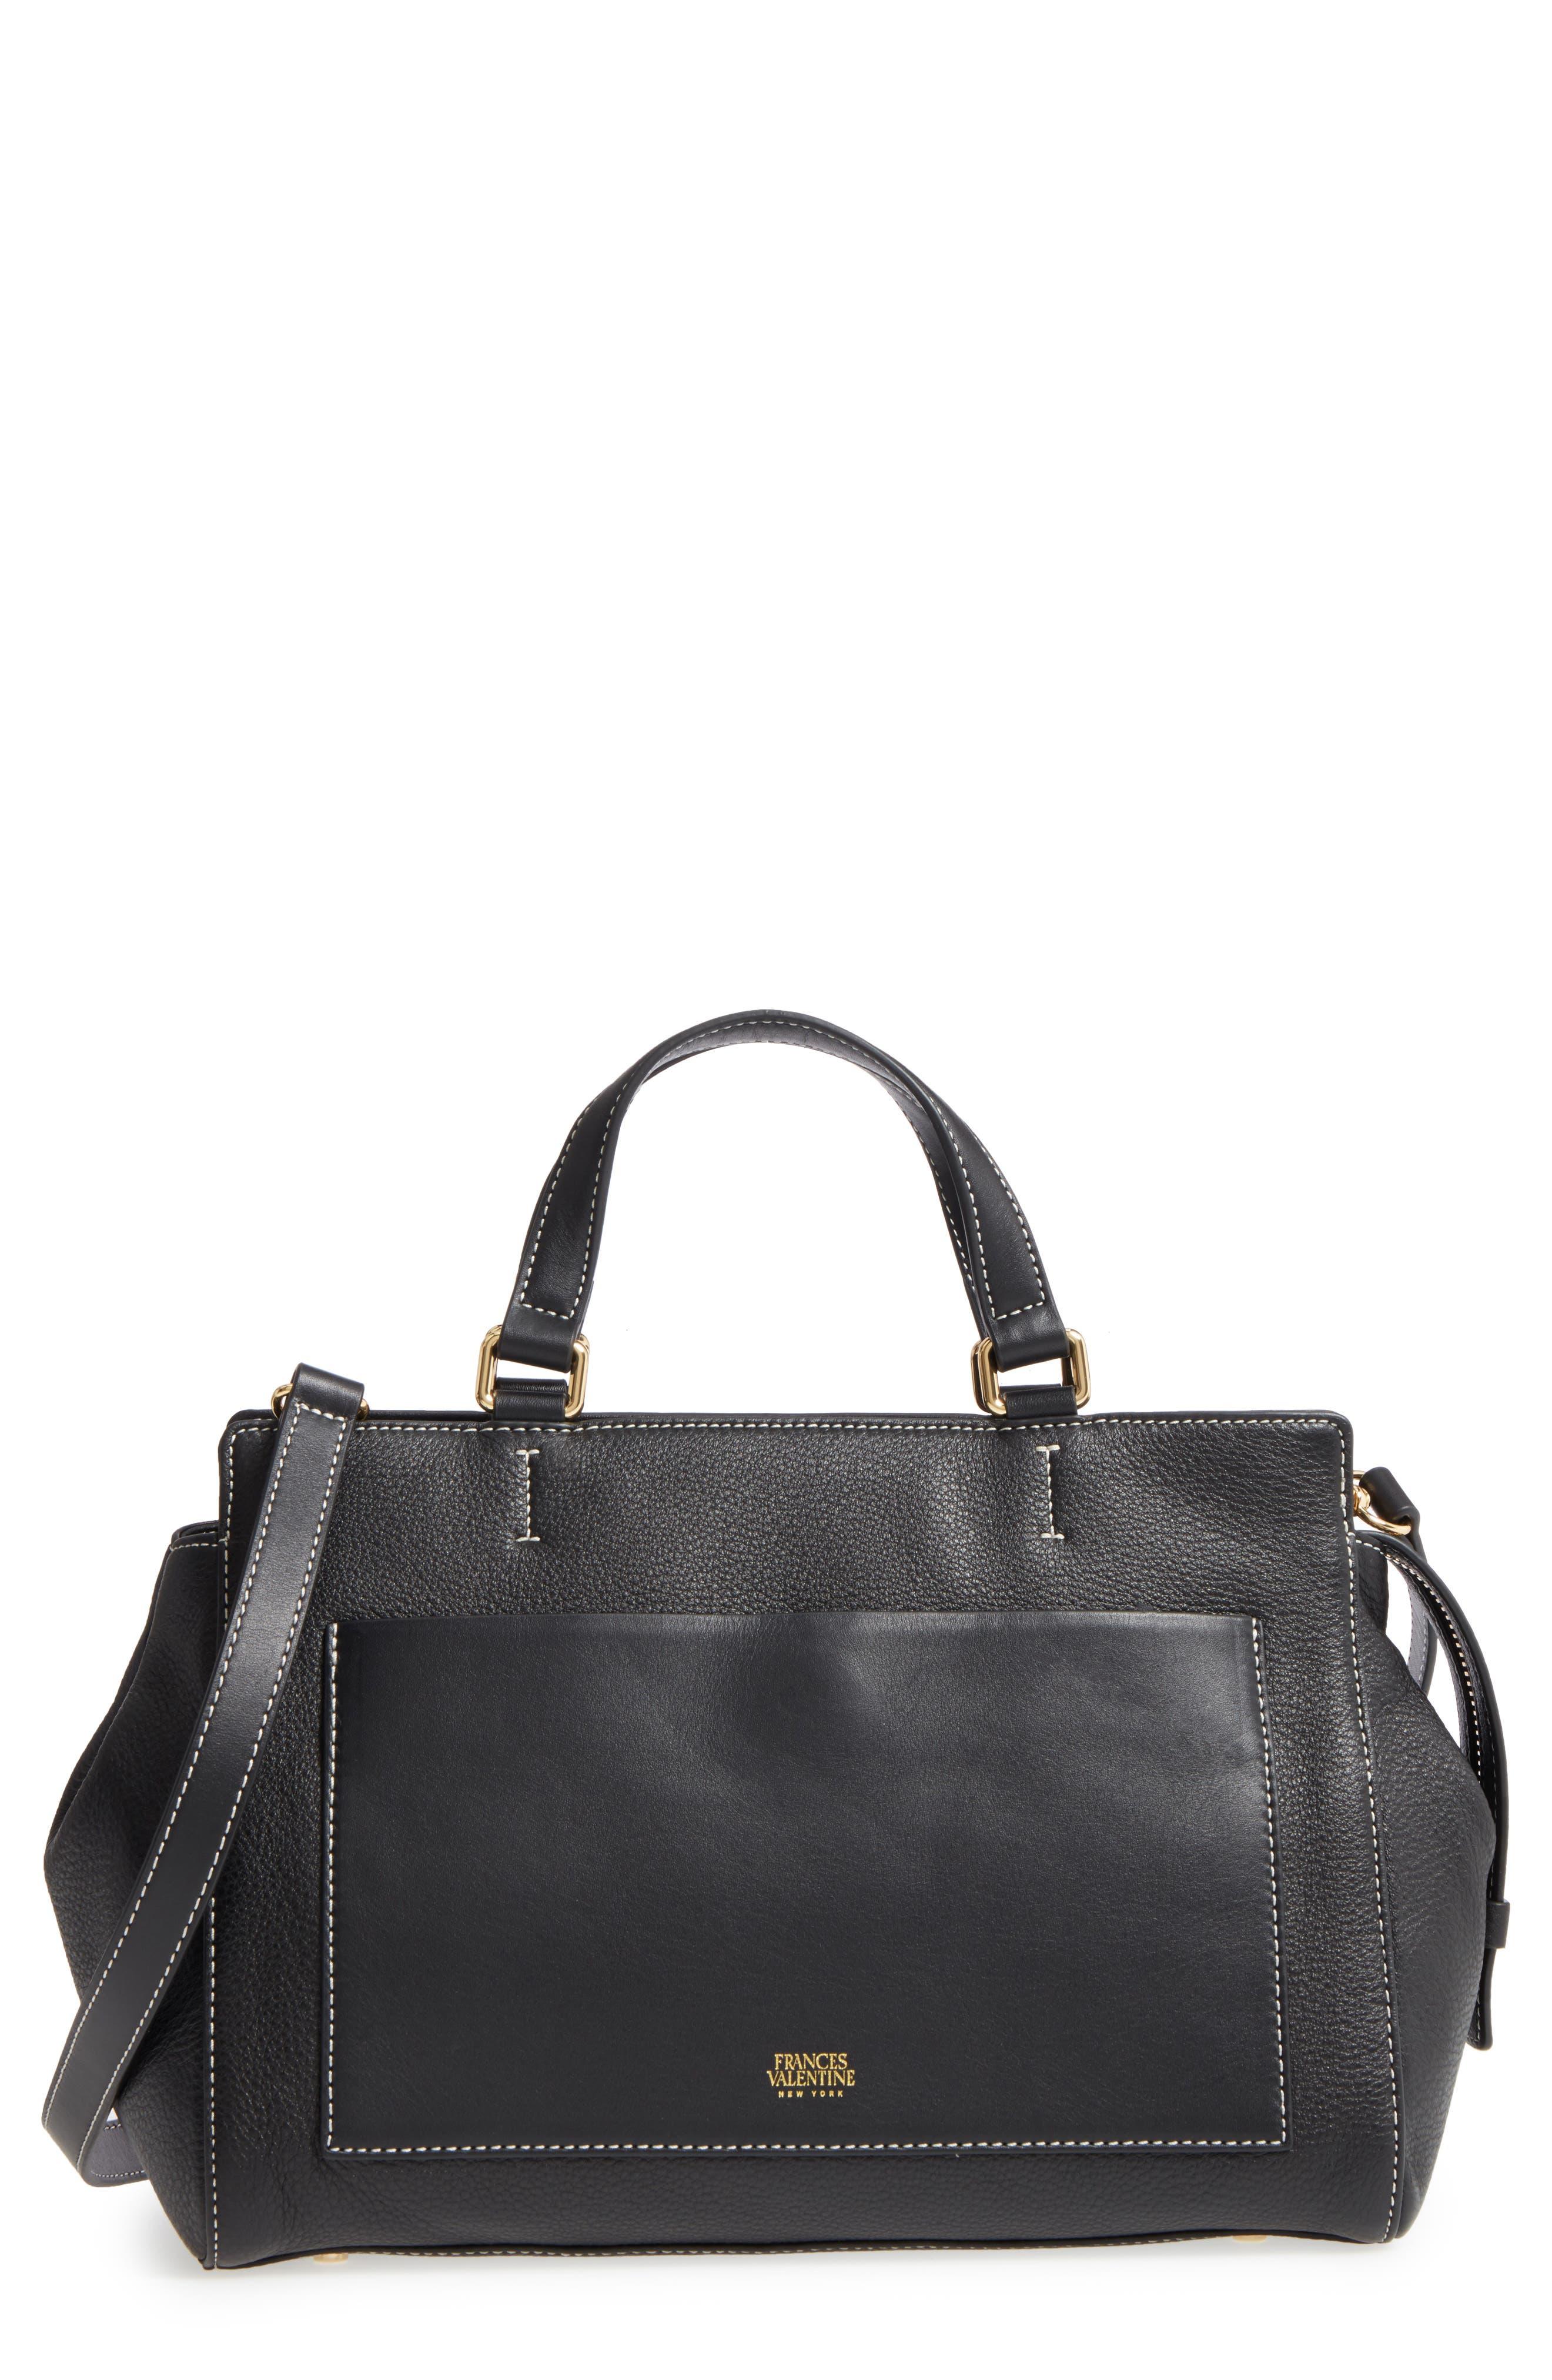 Frances Valentine Anna Leather Top Handle Satchel